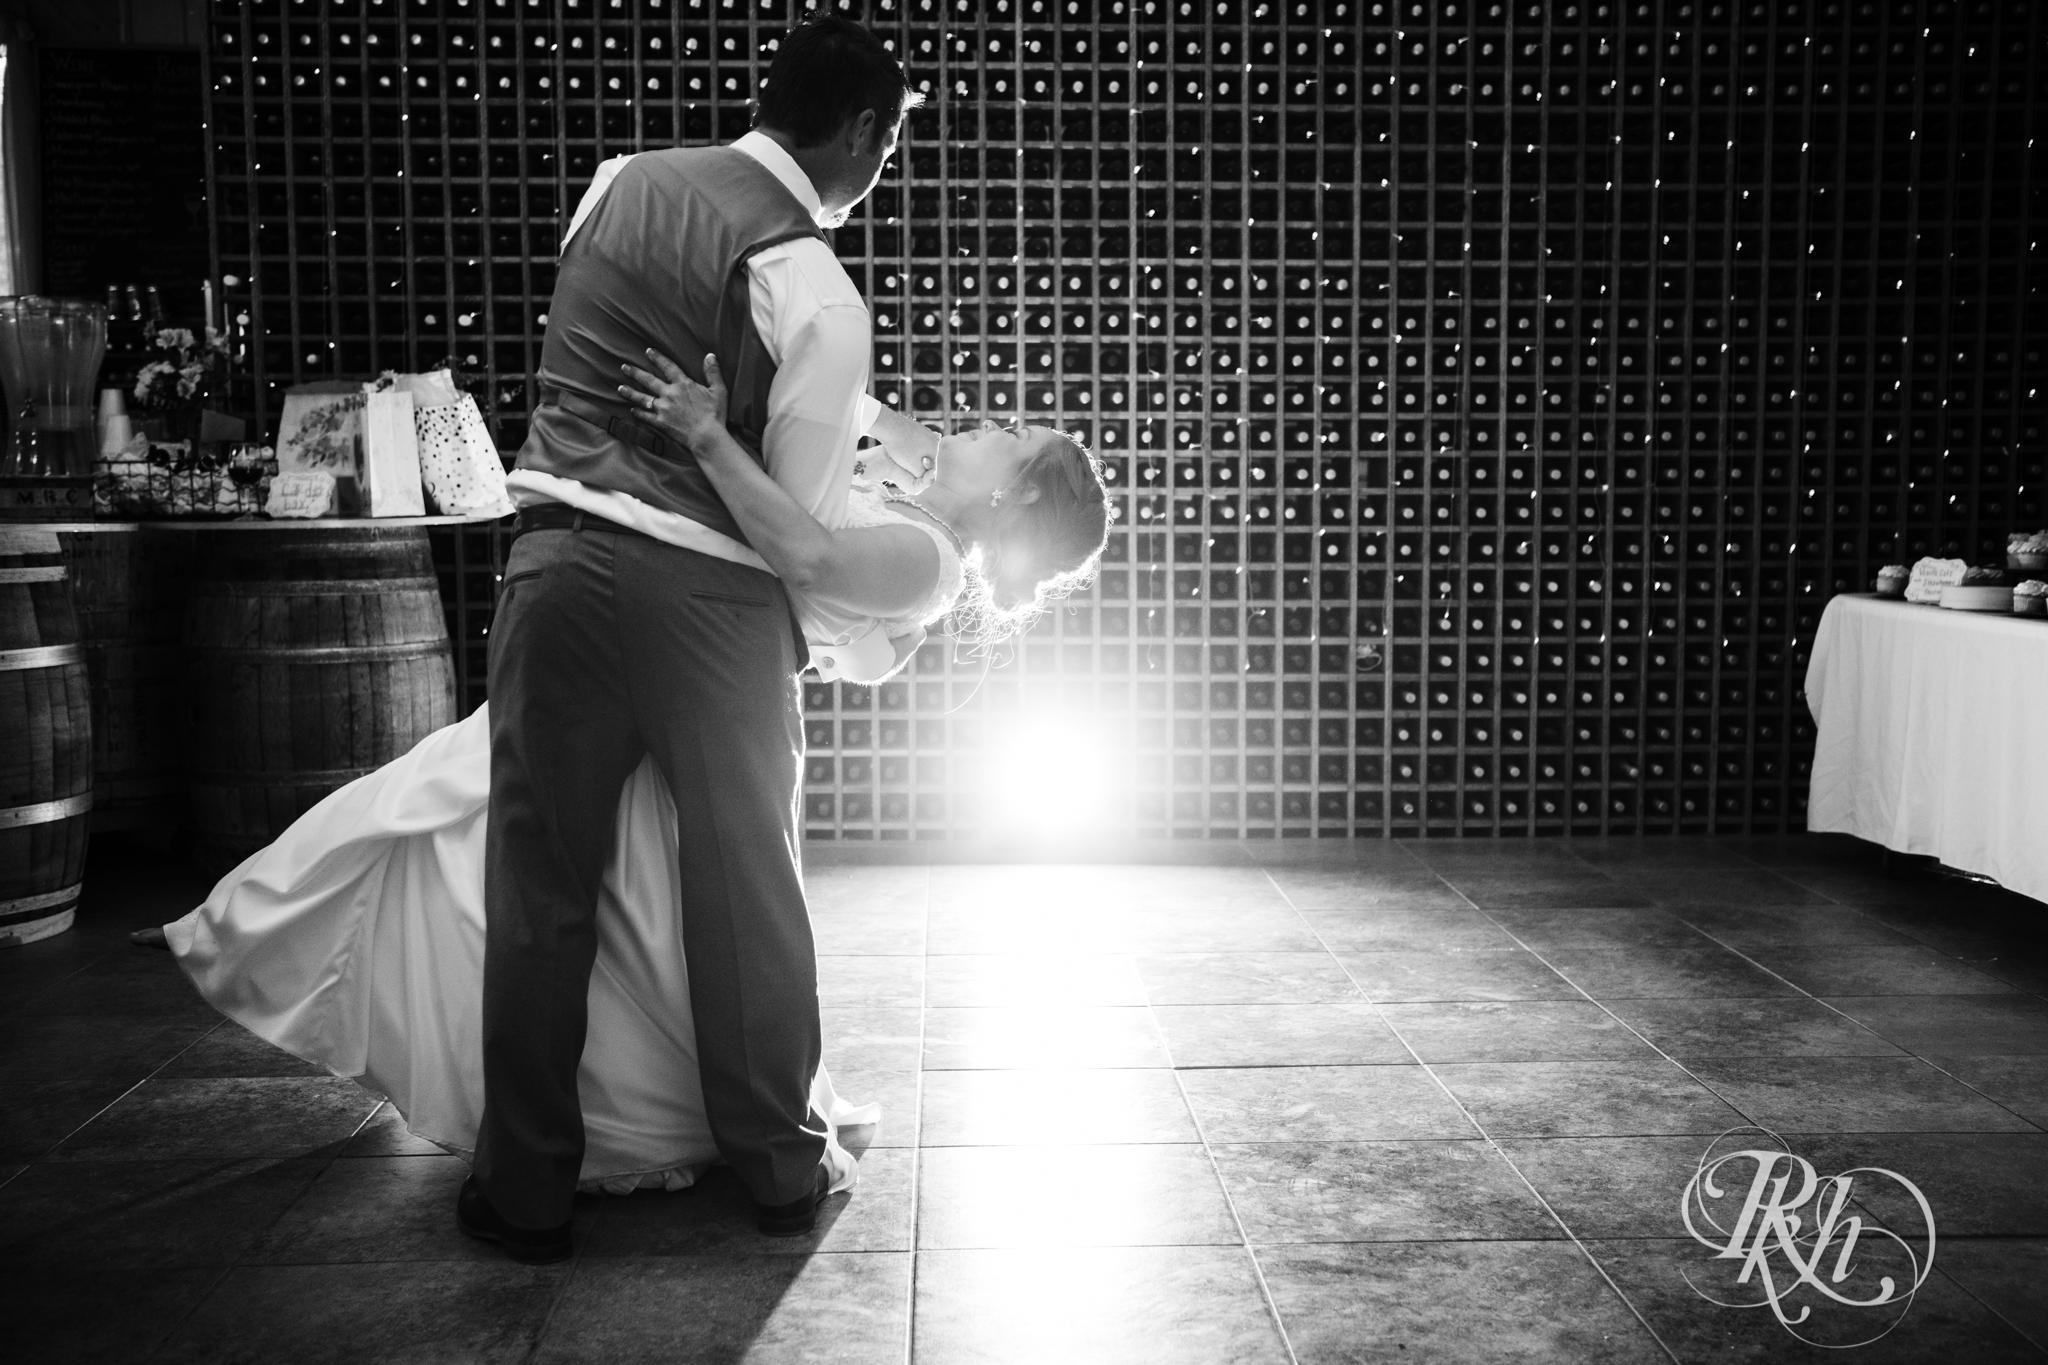 Ally & Nick - Minnesota Wedding Photography - Next Chapter Winery - RKH Images - Blog (43 of 57).jpg